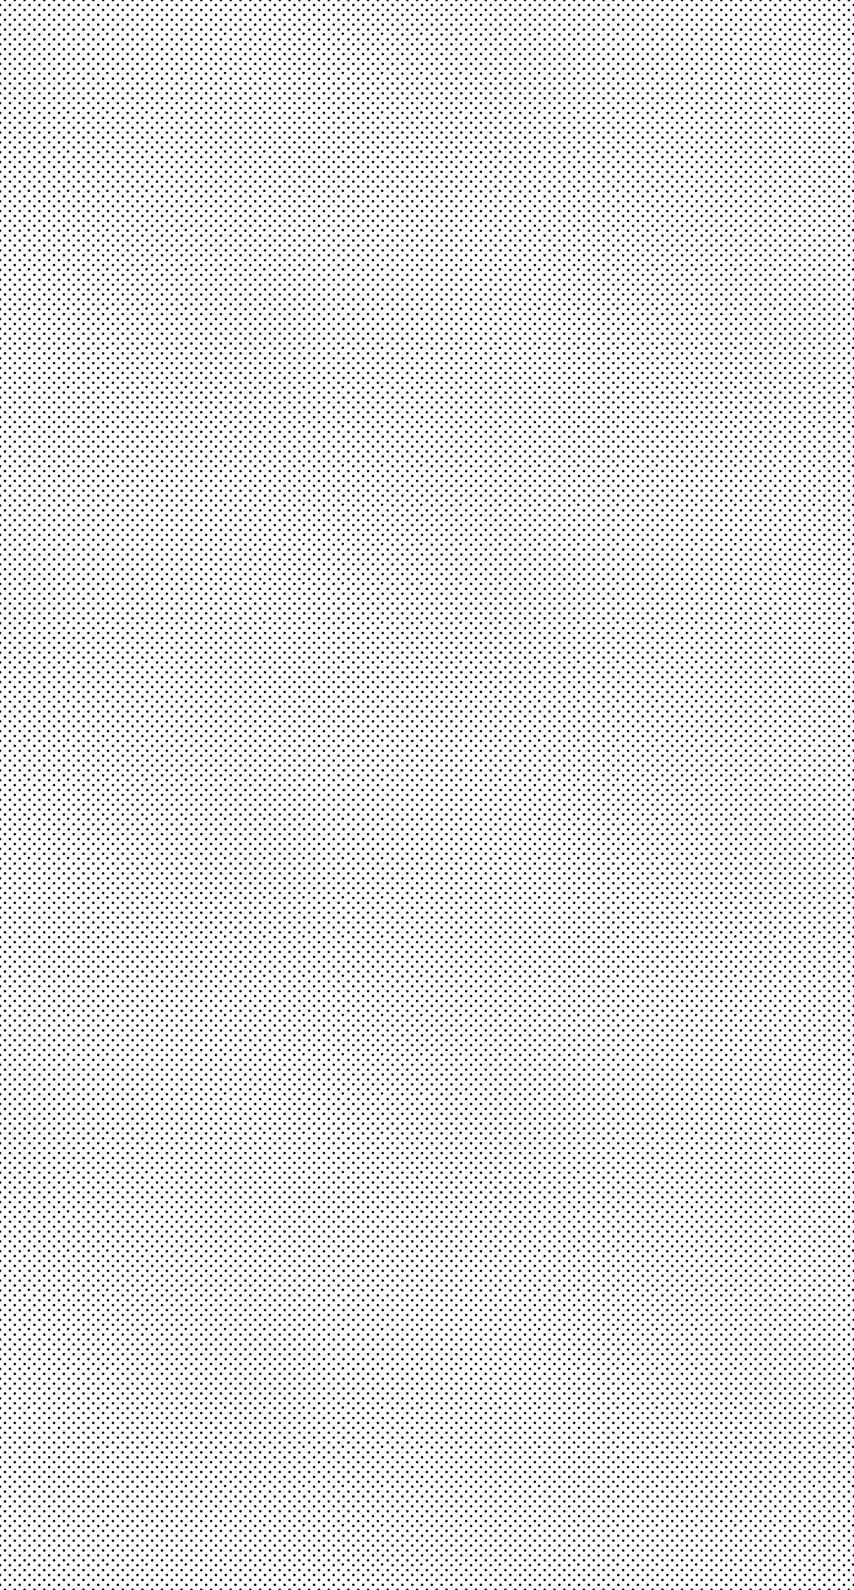 Pattern Dot Black And White Wallpaper Sc Iphone7